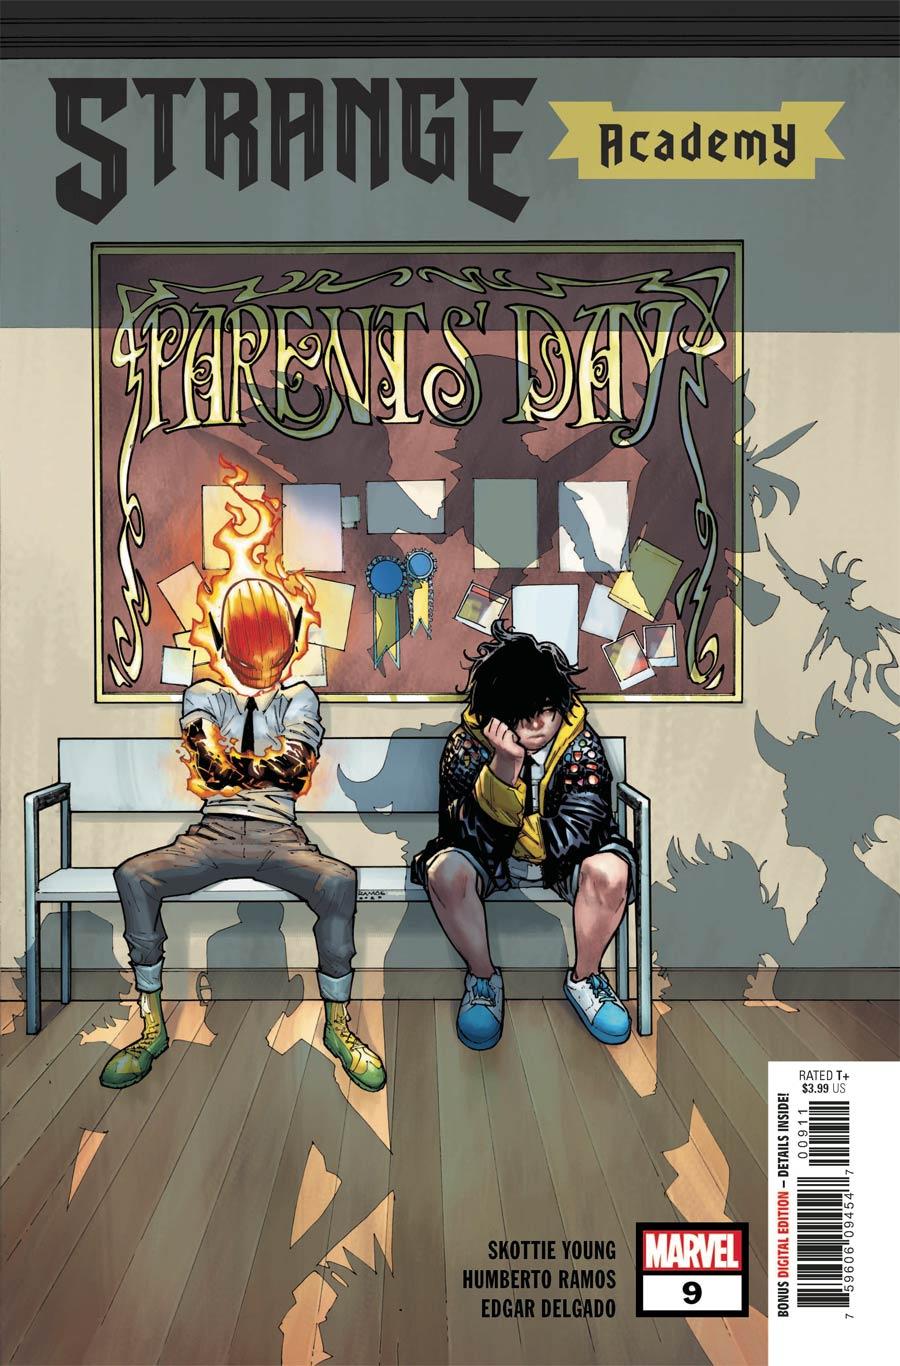 Strange Academy #9 Cover A Regular Humberto Ramos Cover